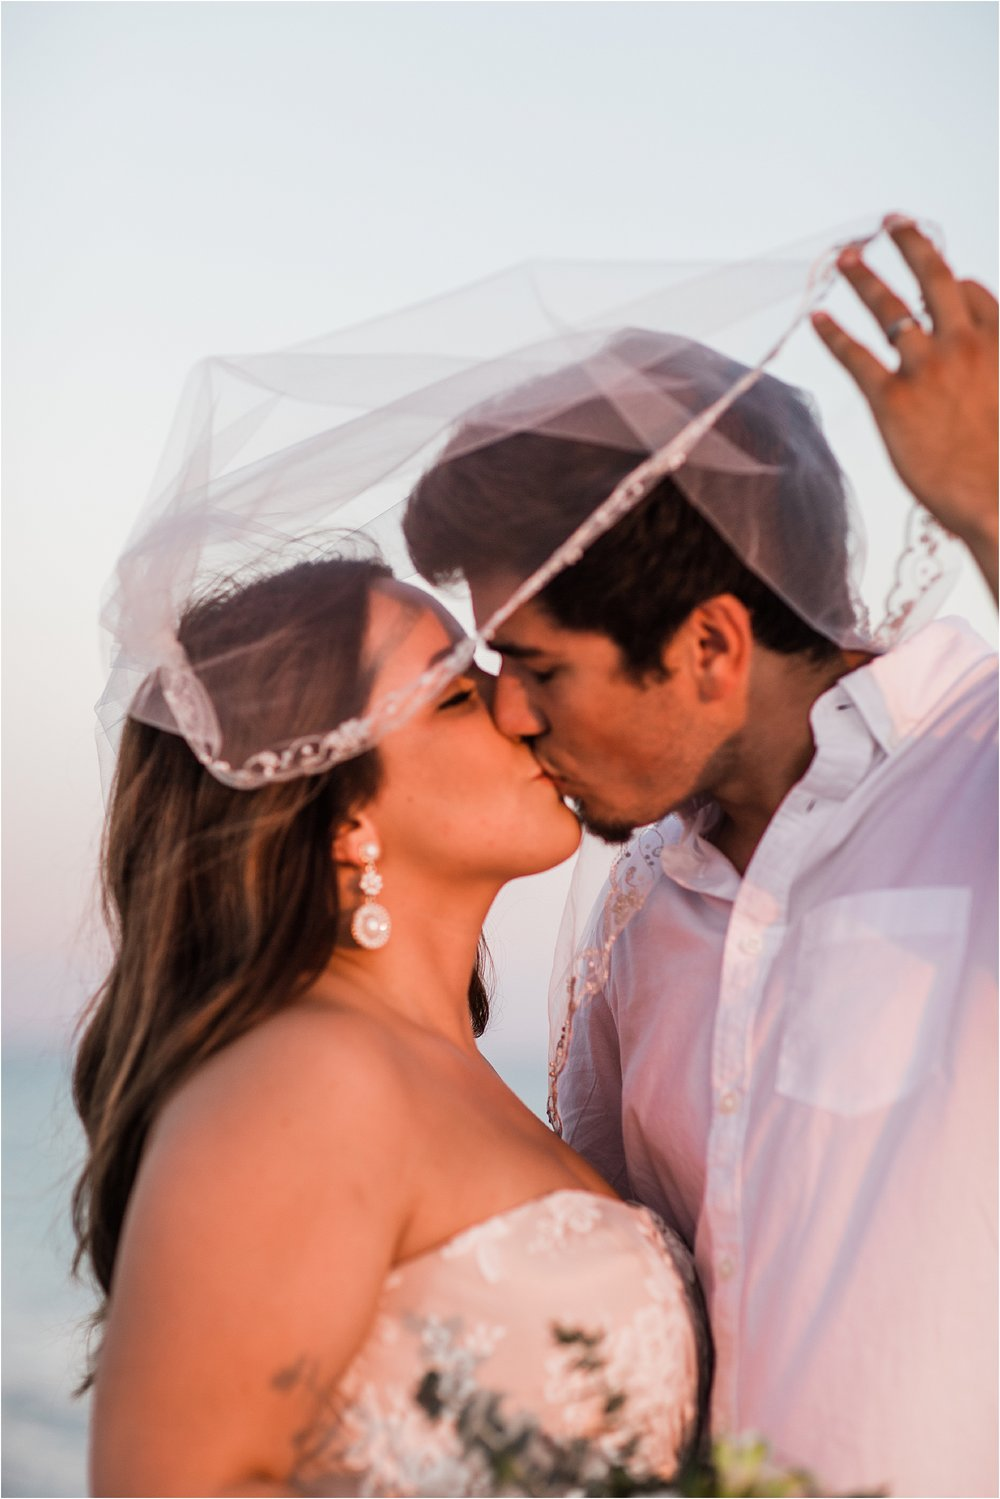 Wedding Ceremony Officiant In Pensacola Beach